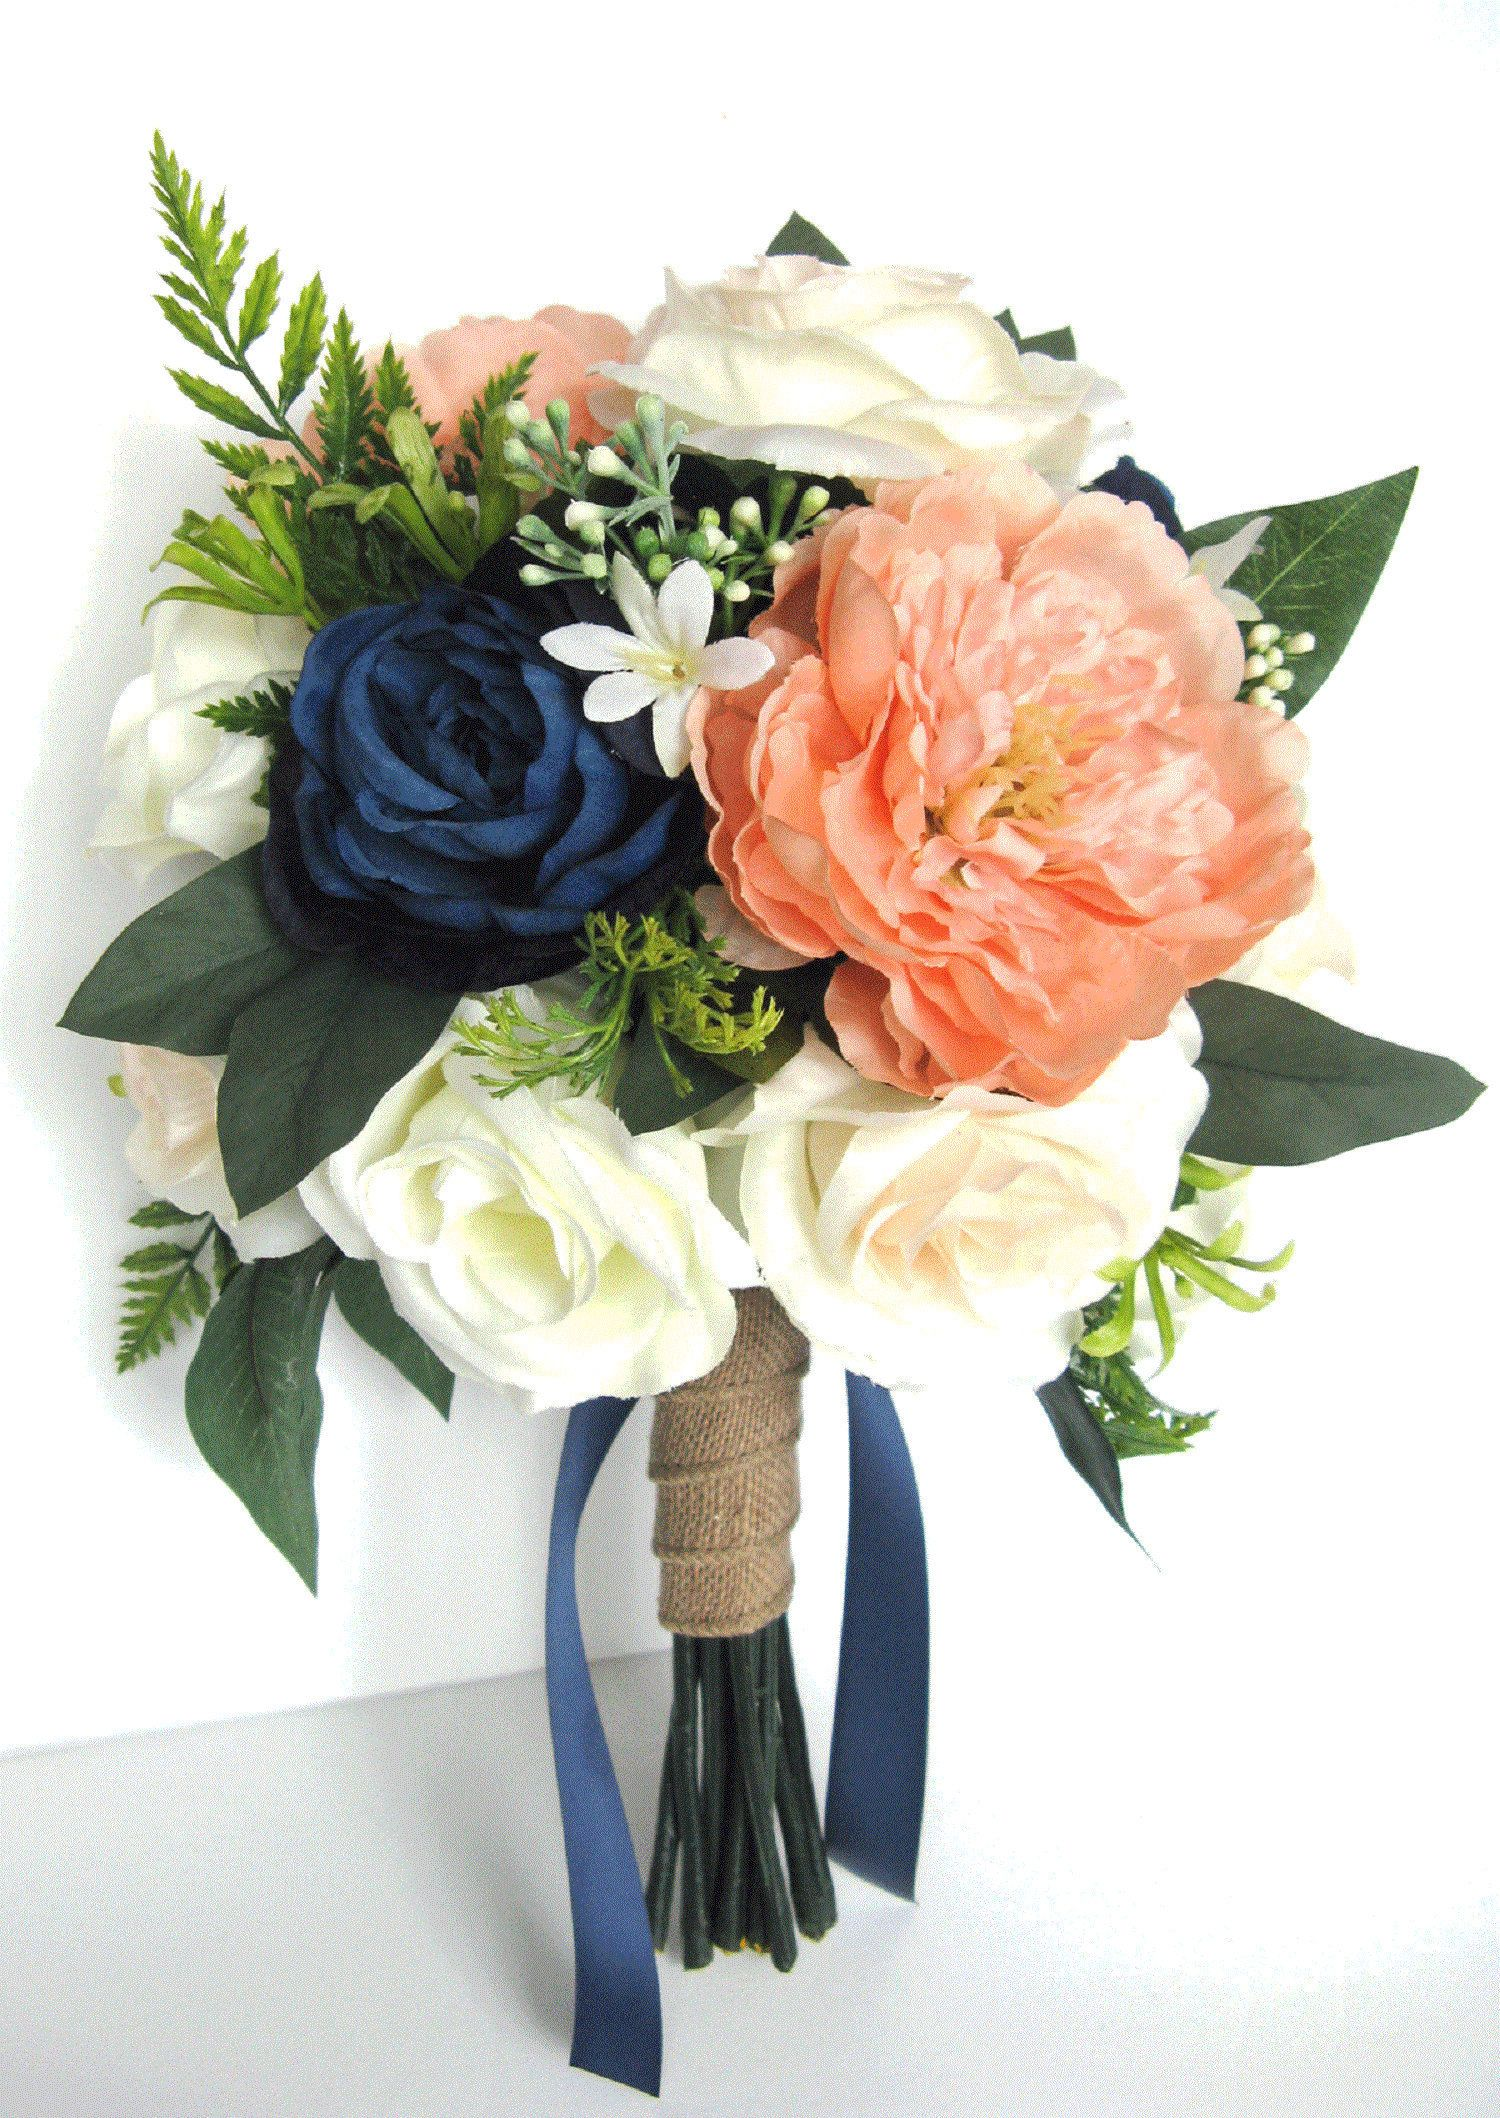 Wedding Bouquet Bridal Bouquet 17 piece package Silk flower Bouquet CORAL NAVY Blue PEACH Bridesmaid Bouquet wedding flower RosesandDreams #flowerbouquetwedding